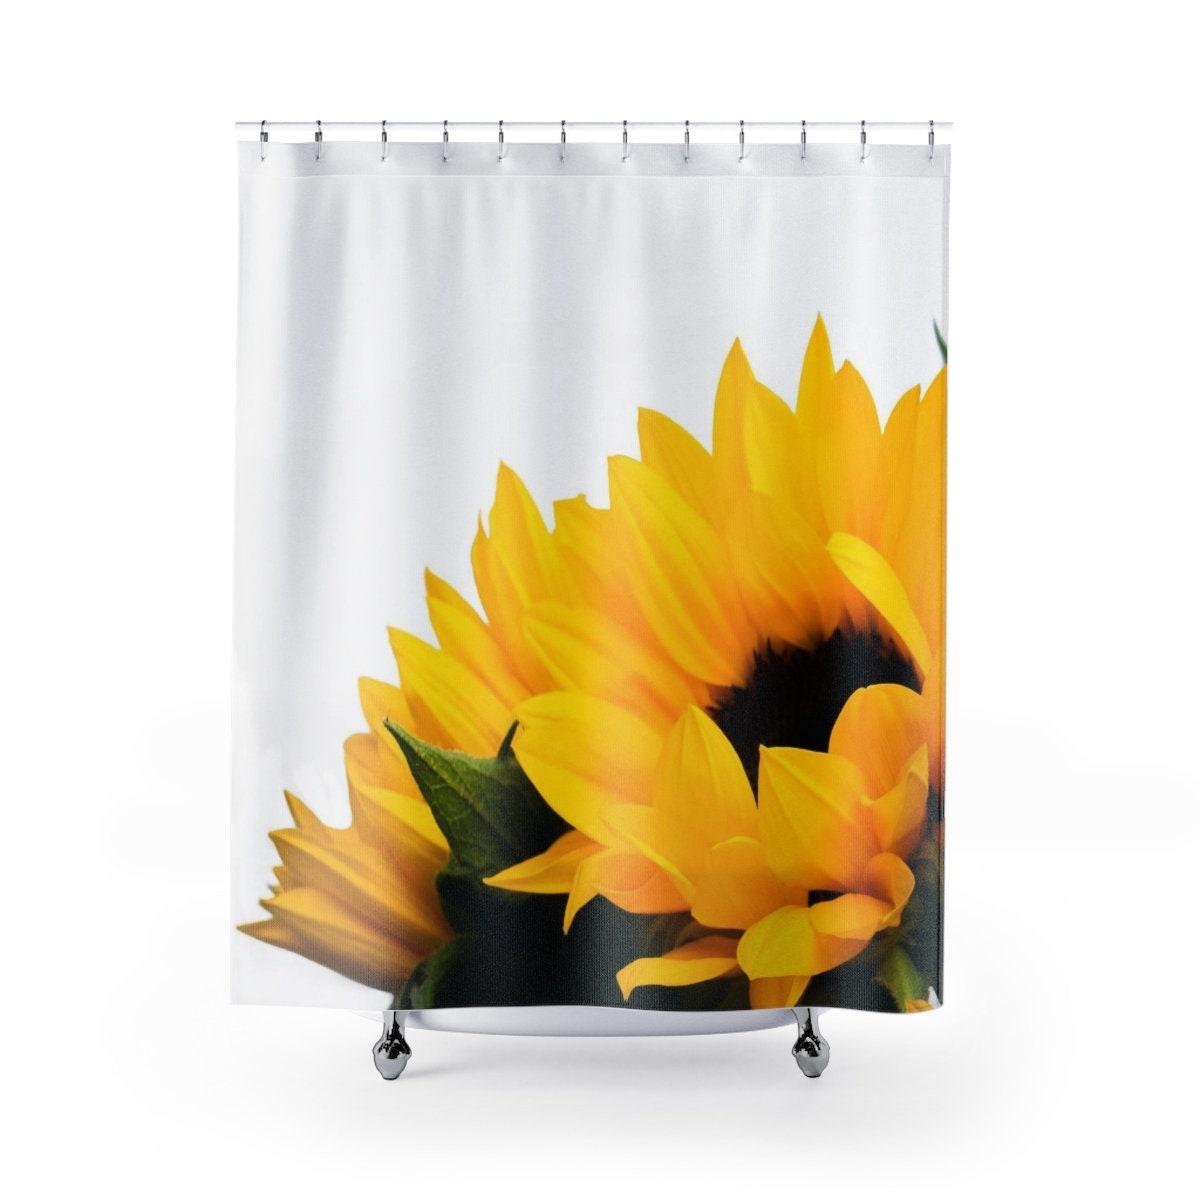 Sunflower Shower Curtain Decor